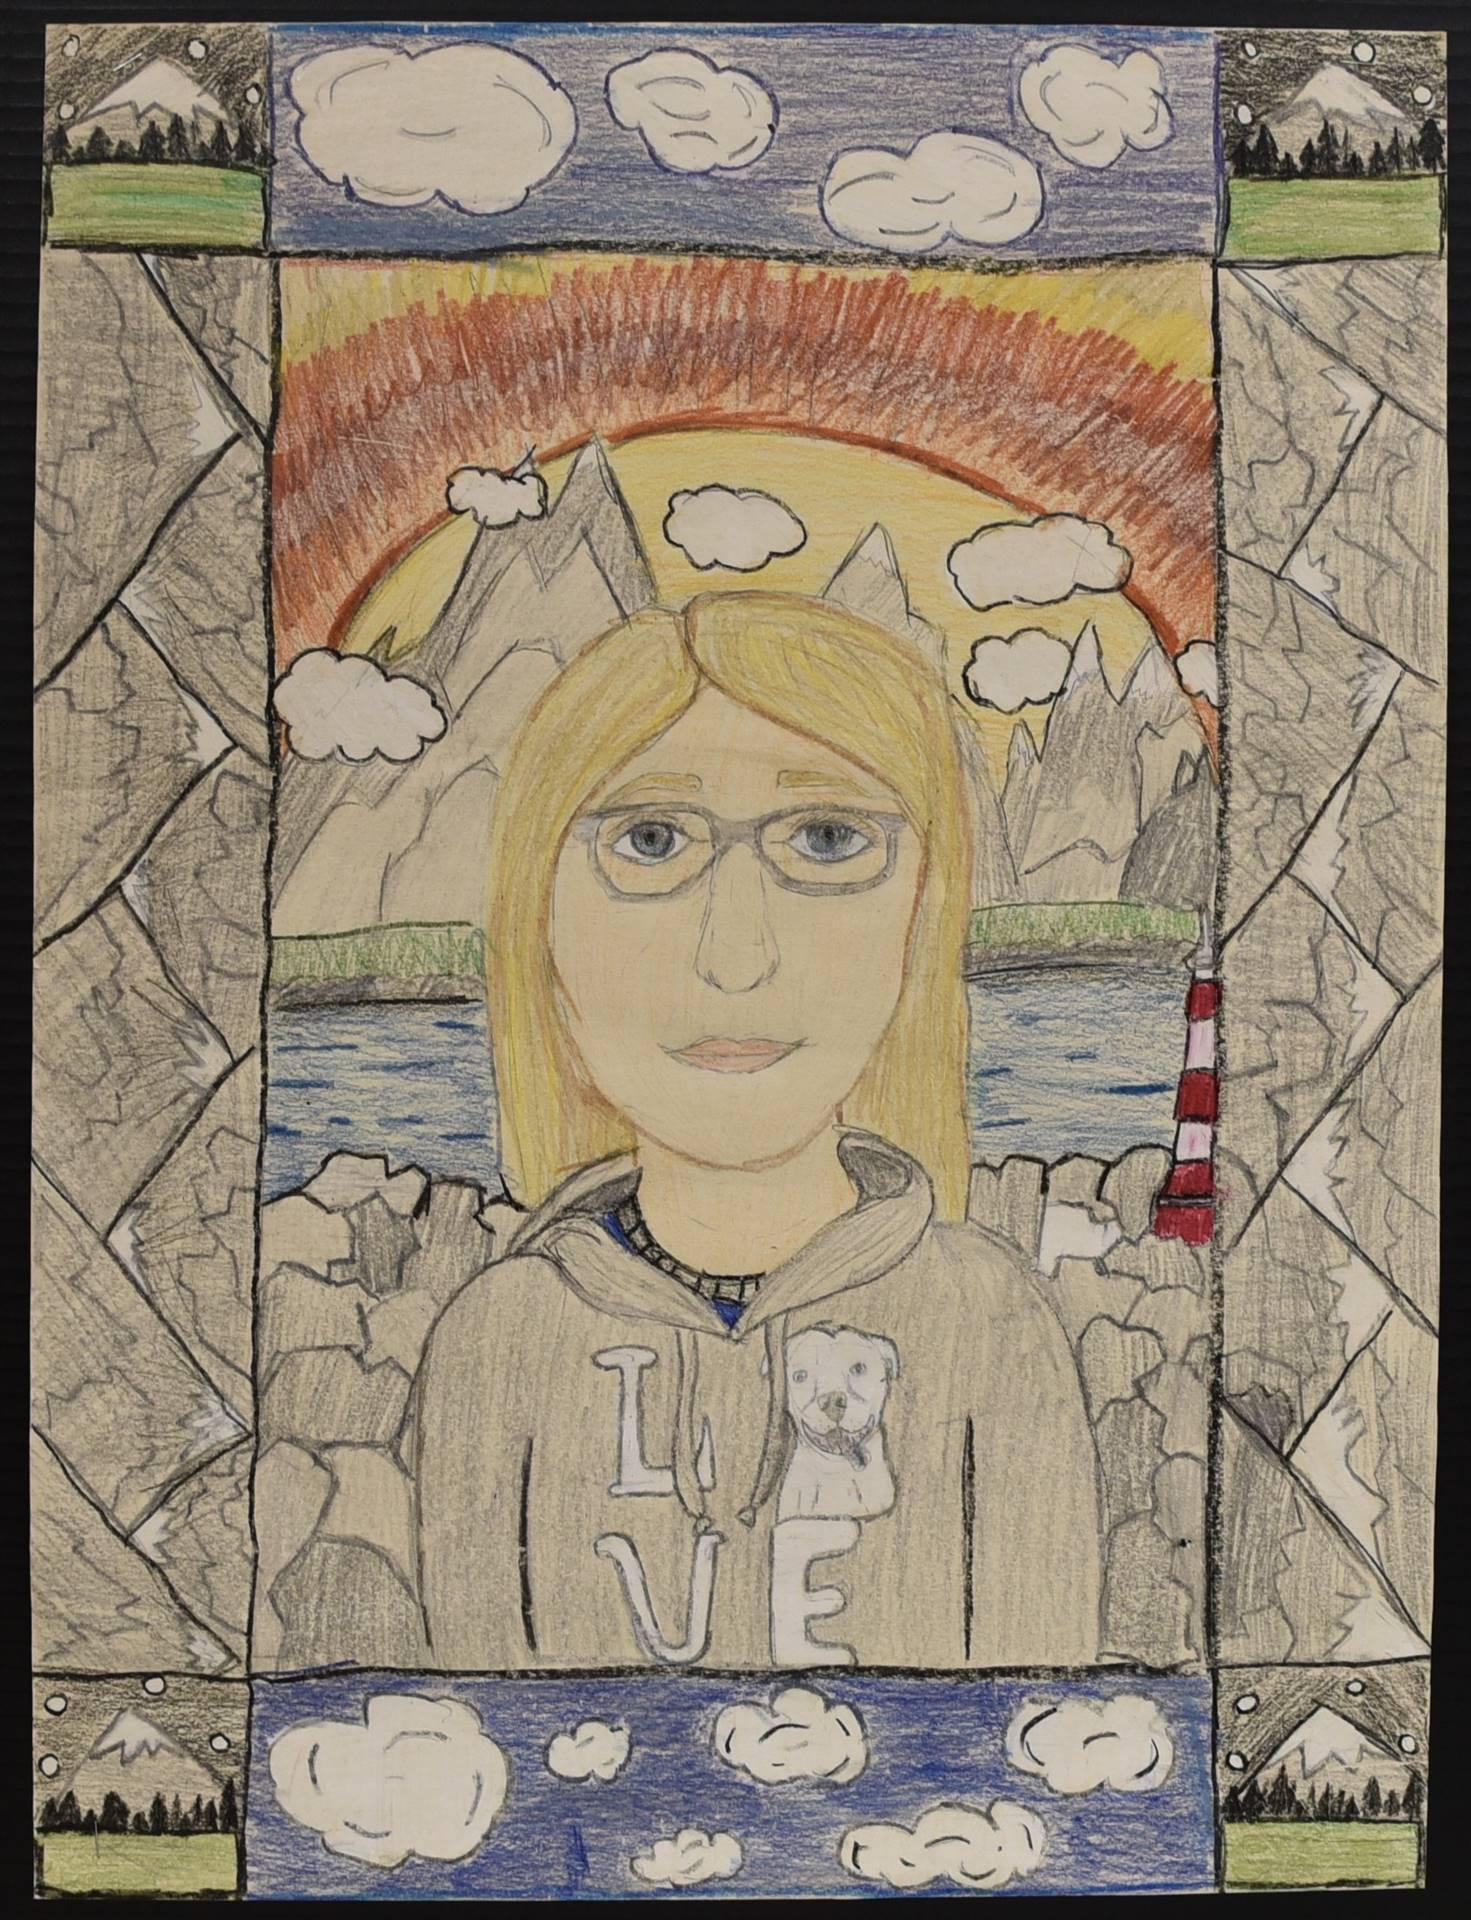 Brecksville-Broadview Hts. Middle School Art Projects 159